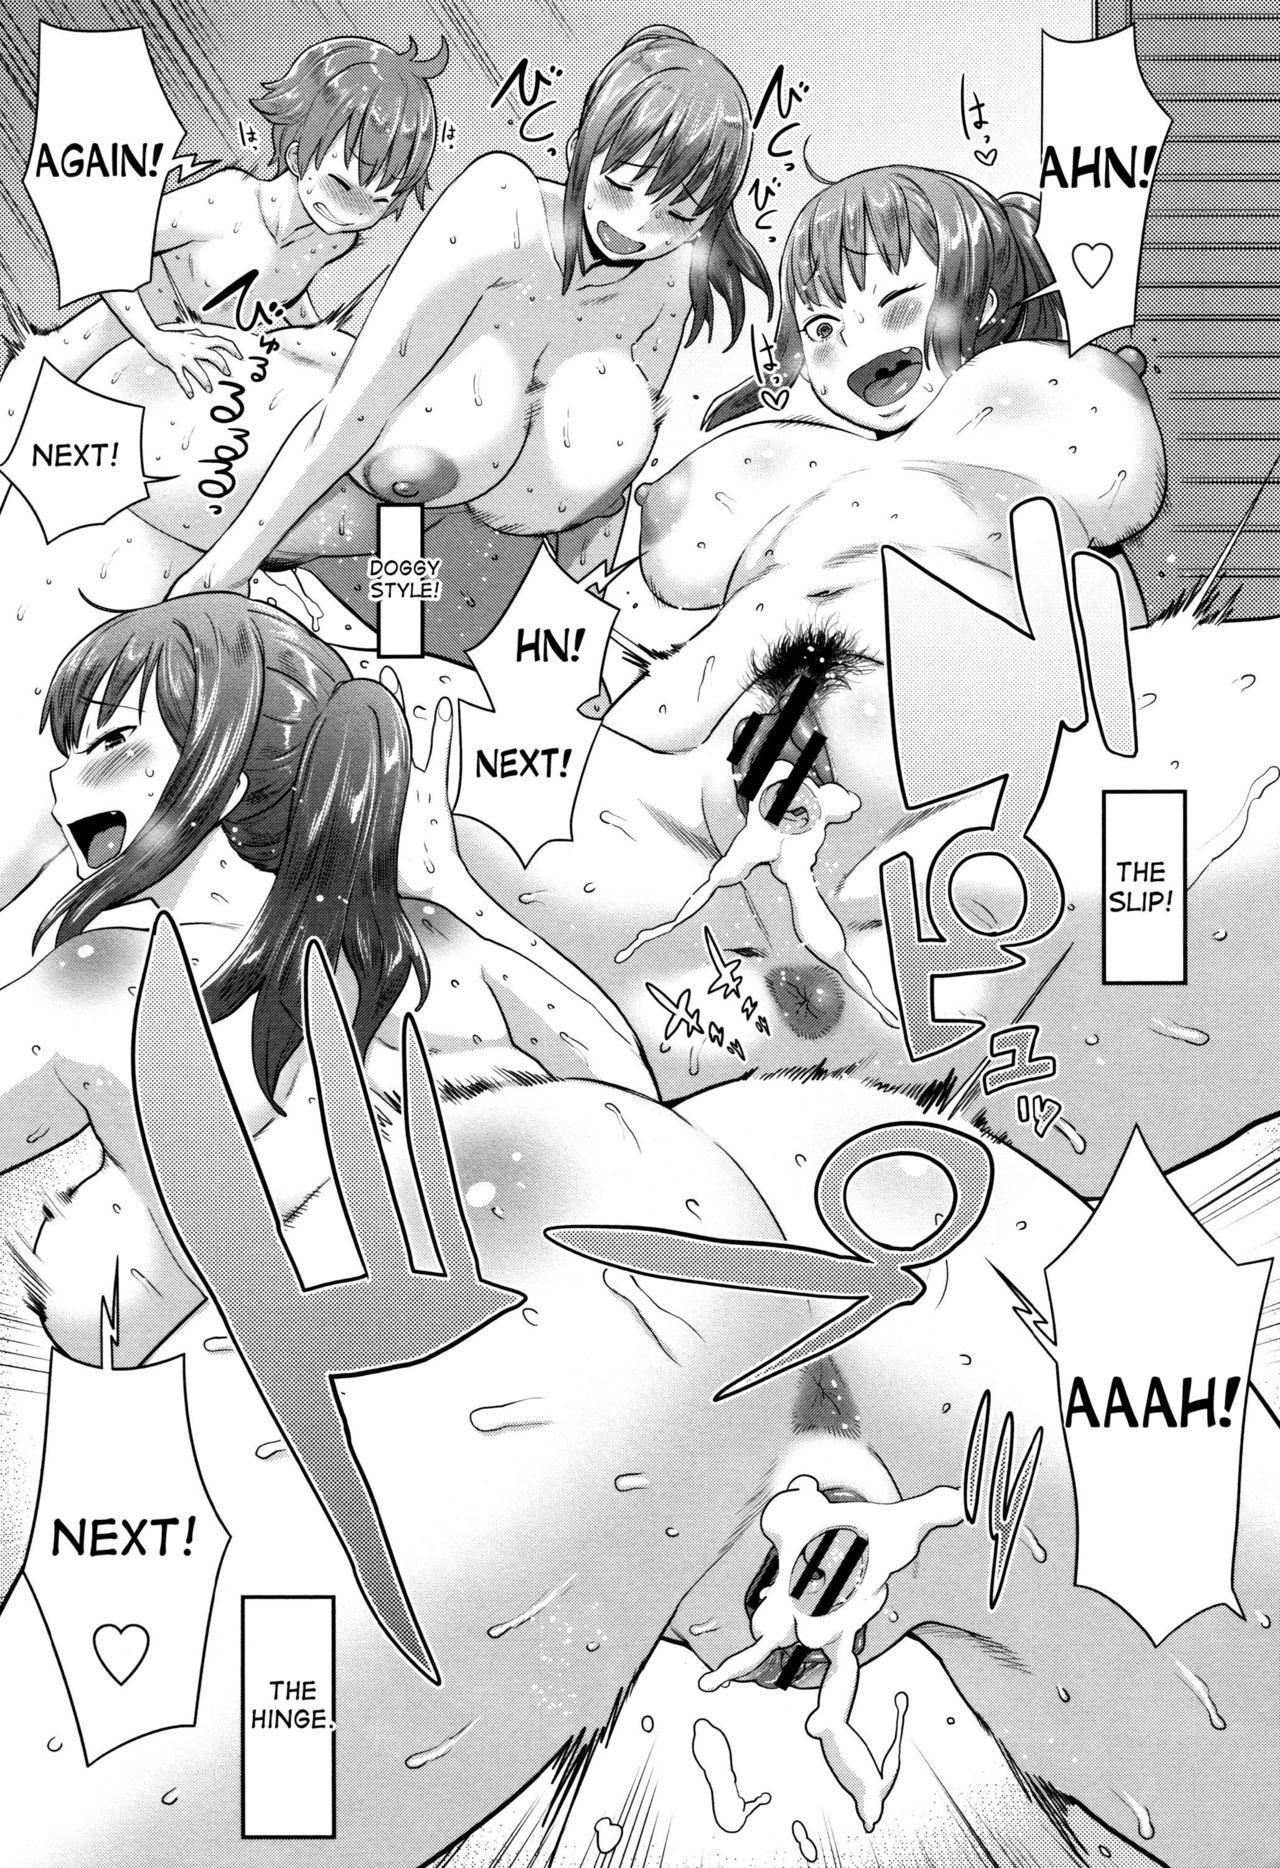 [Agata] Natsu no Owari ni Ijiwaru Nee-chan - My mean elder sister at the end of summer. (Mama Para ~Chijo Zunkan~) [English] [desudesu] 16